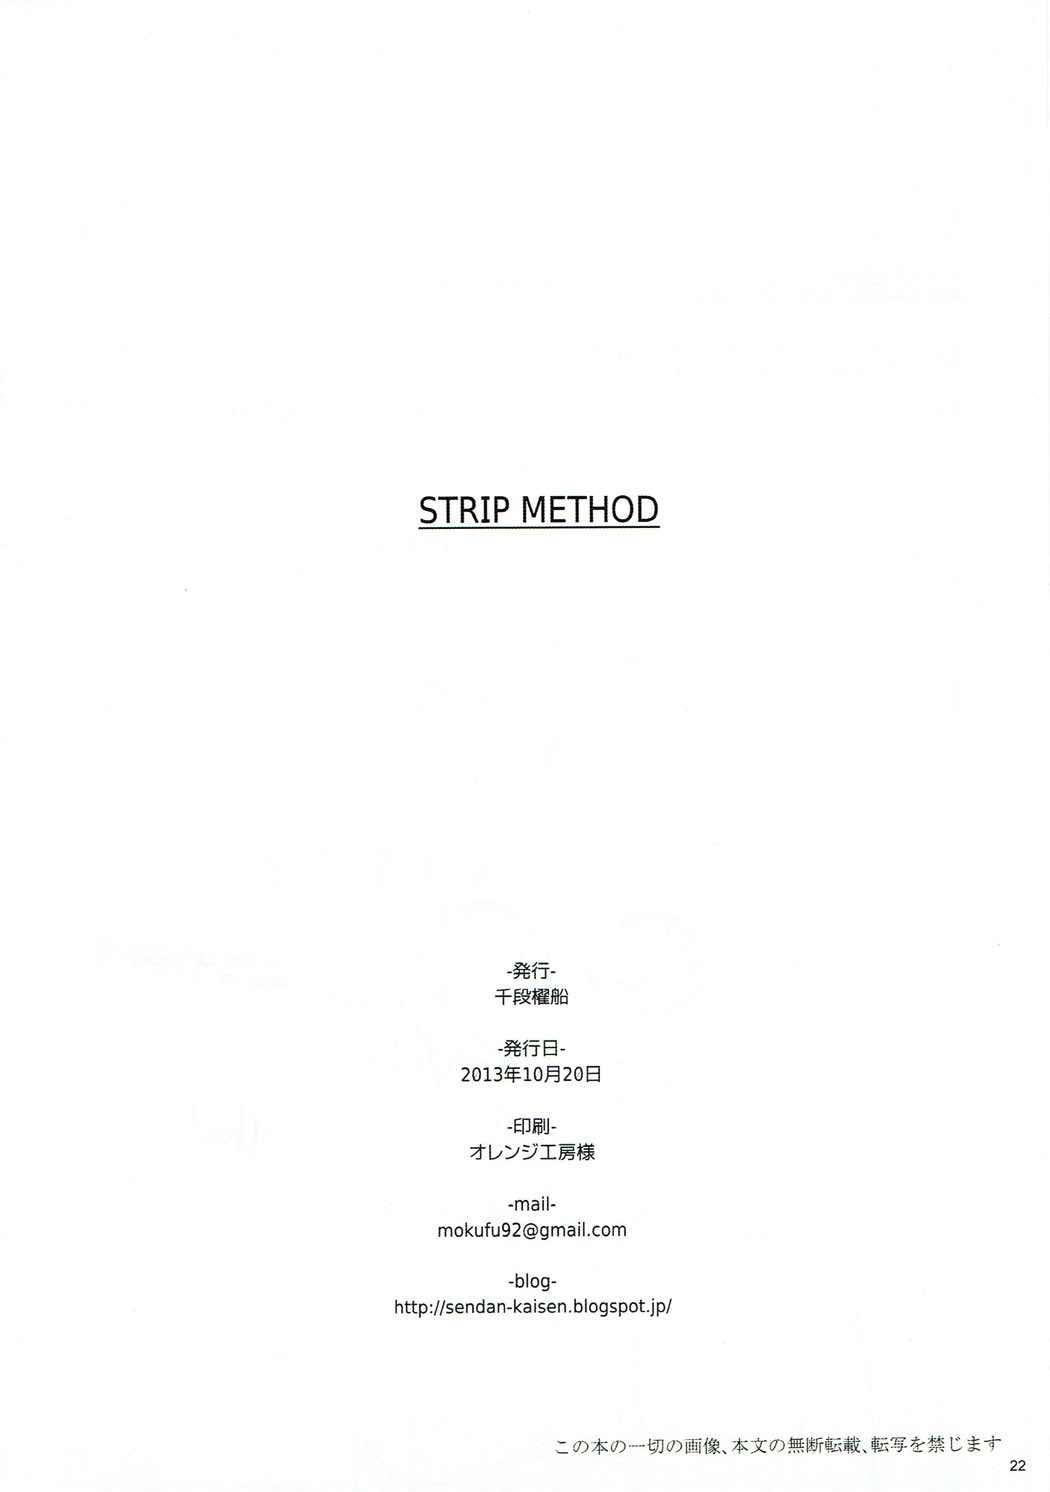 STRIP METHOD 20